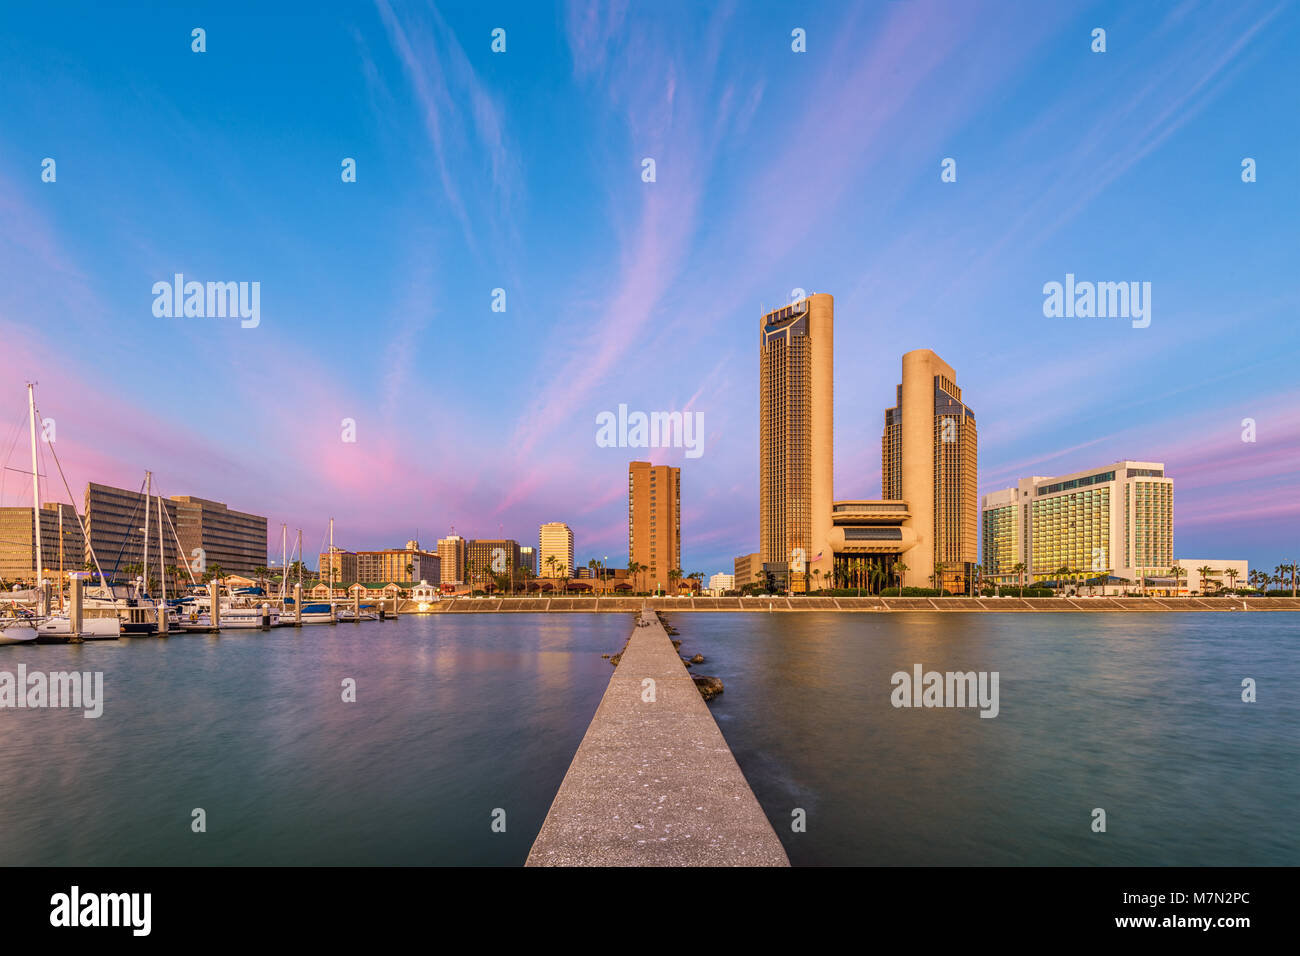 Corpus Christi, Texas, USA skyline on the bay. - Stock Image